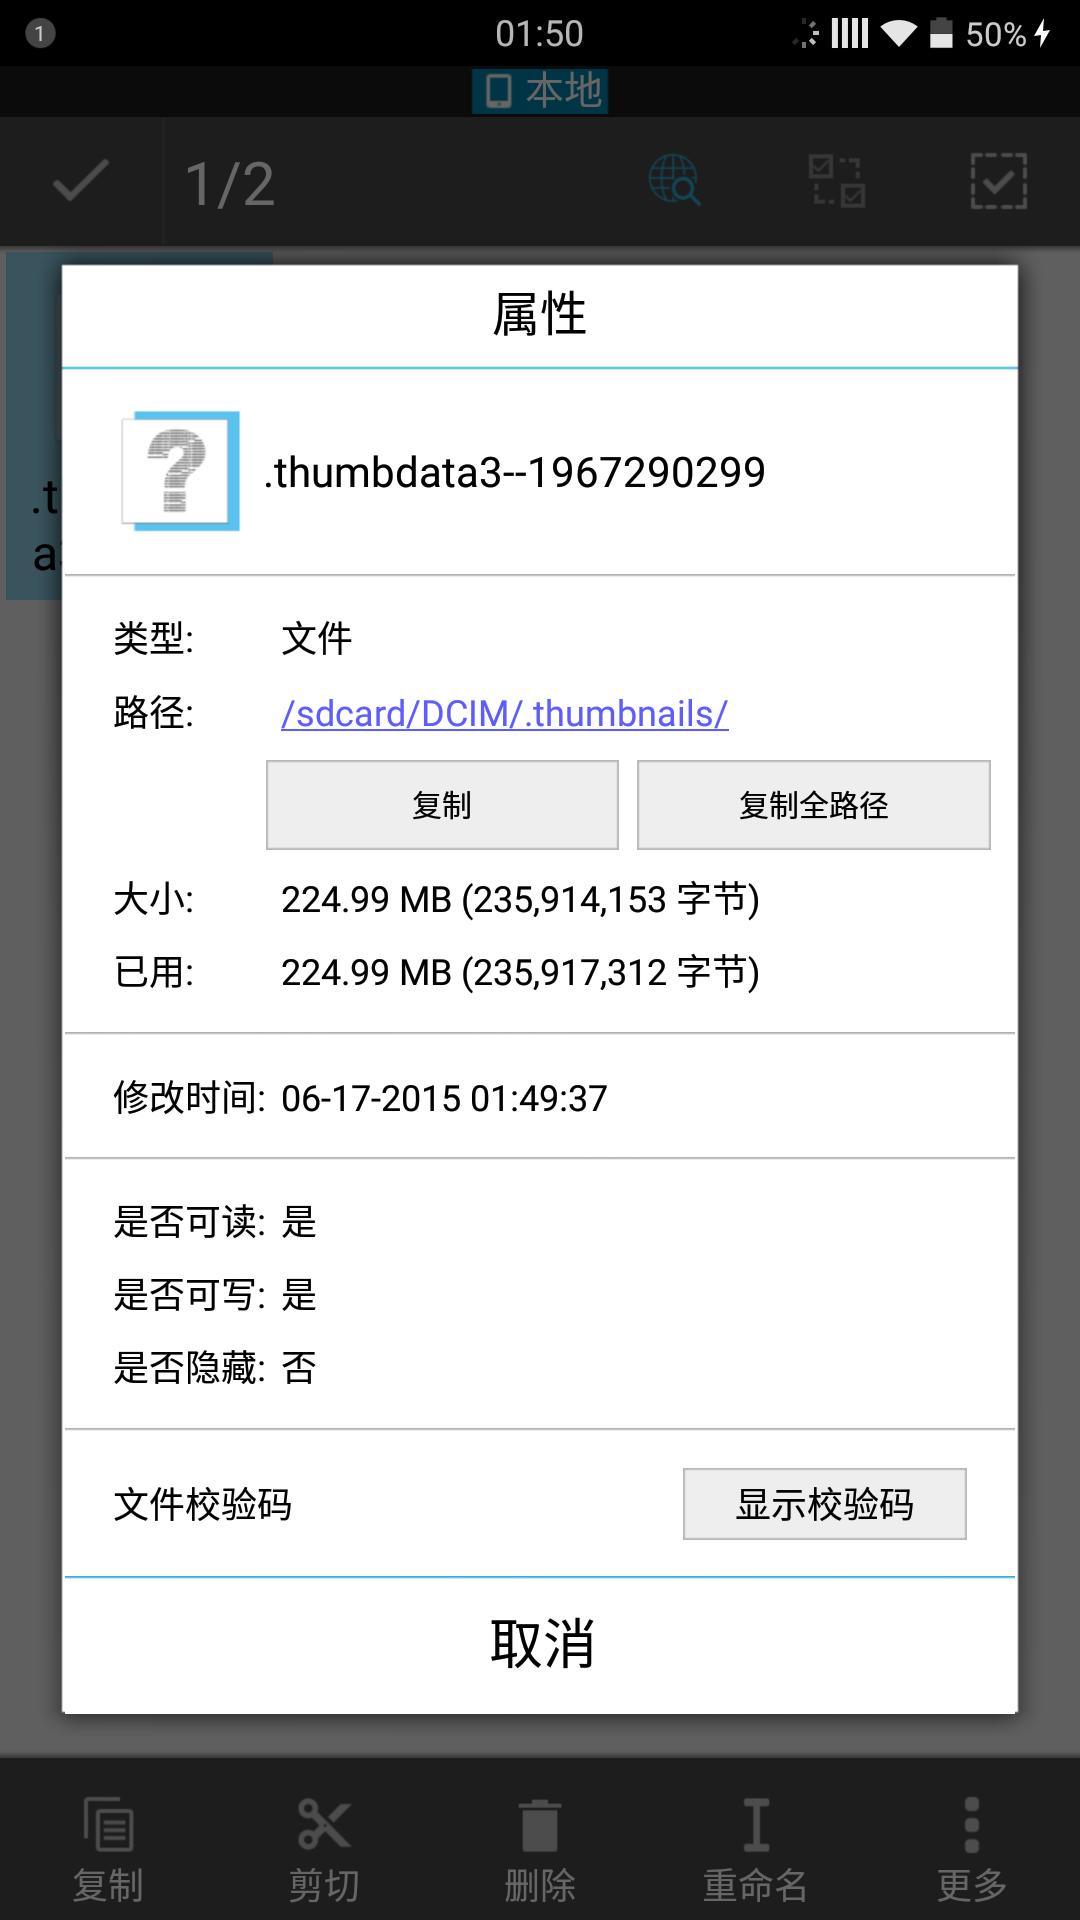 Screenshot_2015-06-17-01-50-24.png